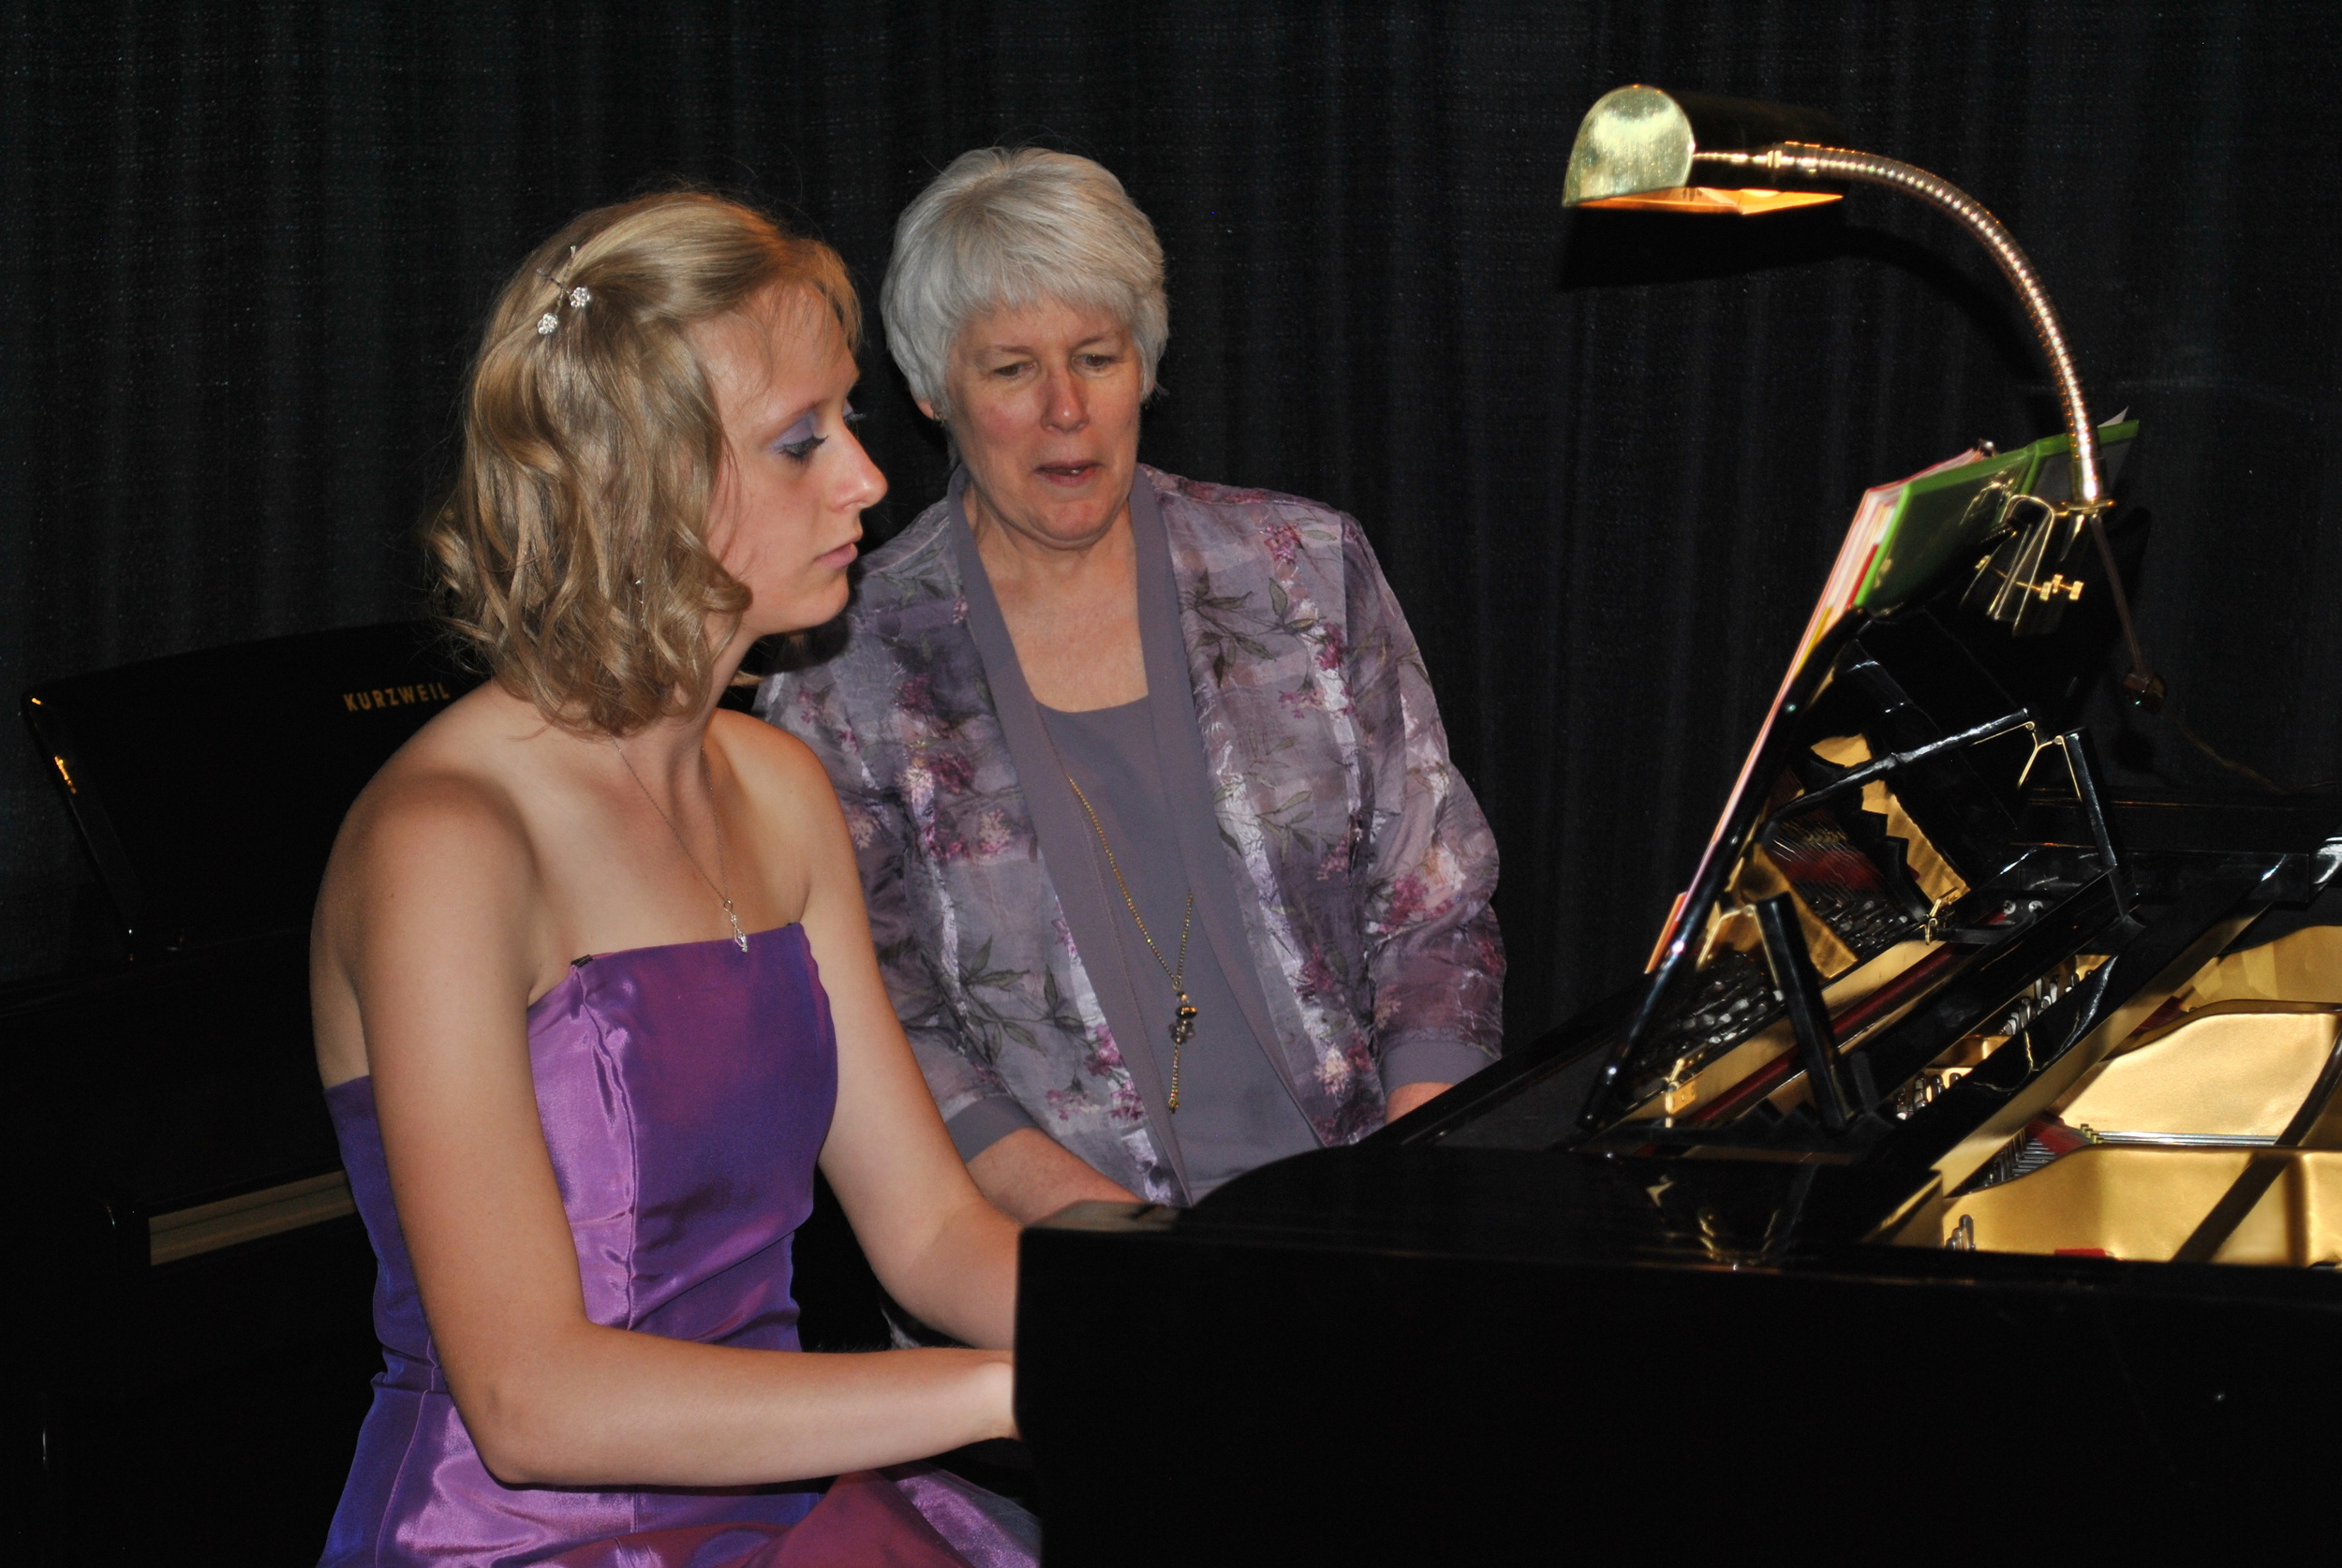 Valerie Lesser performs her Senior Recital on April 27, 2014